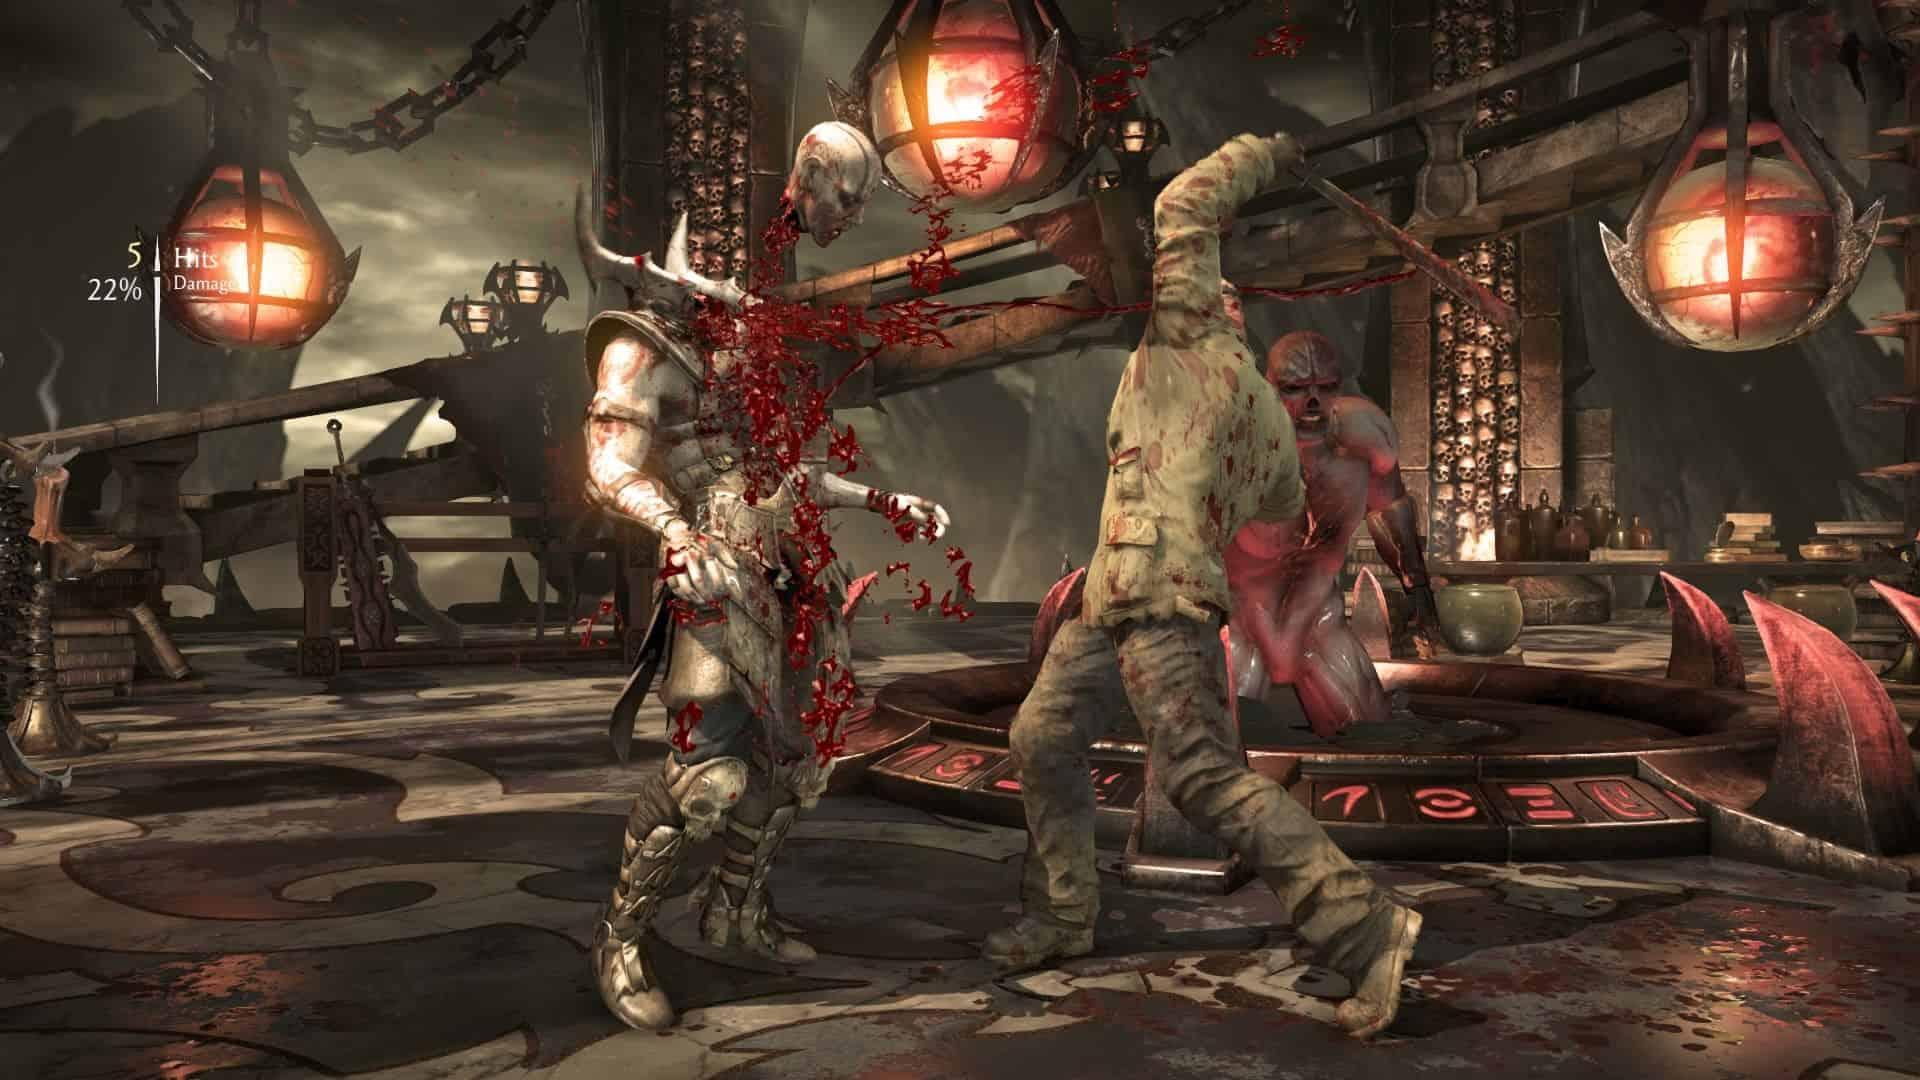 <b>Mortal</b> <b>Kombat</b> <b>X</b> - <b>PC</b> - Torrents Games